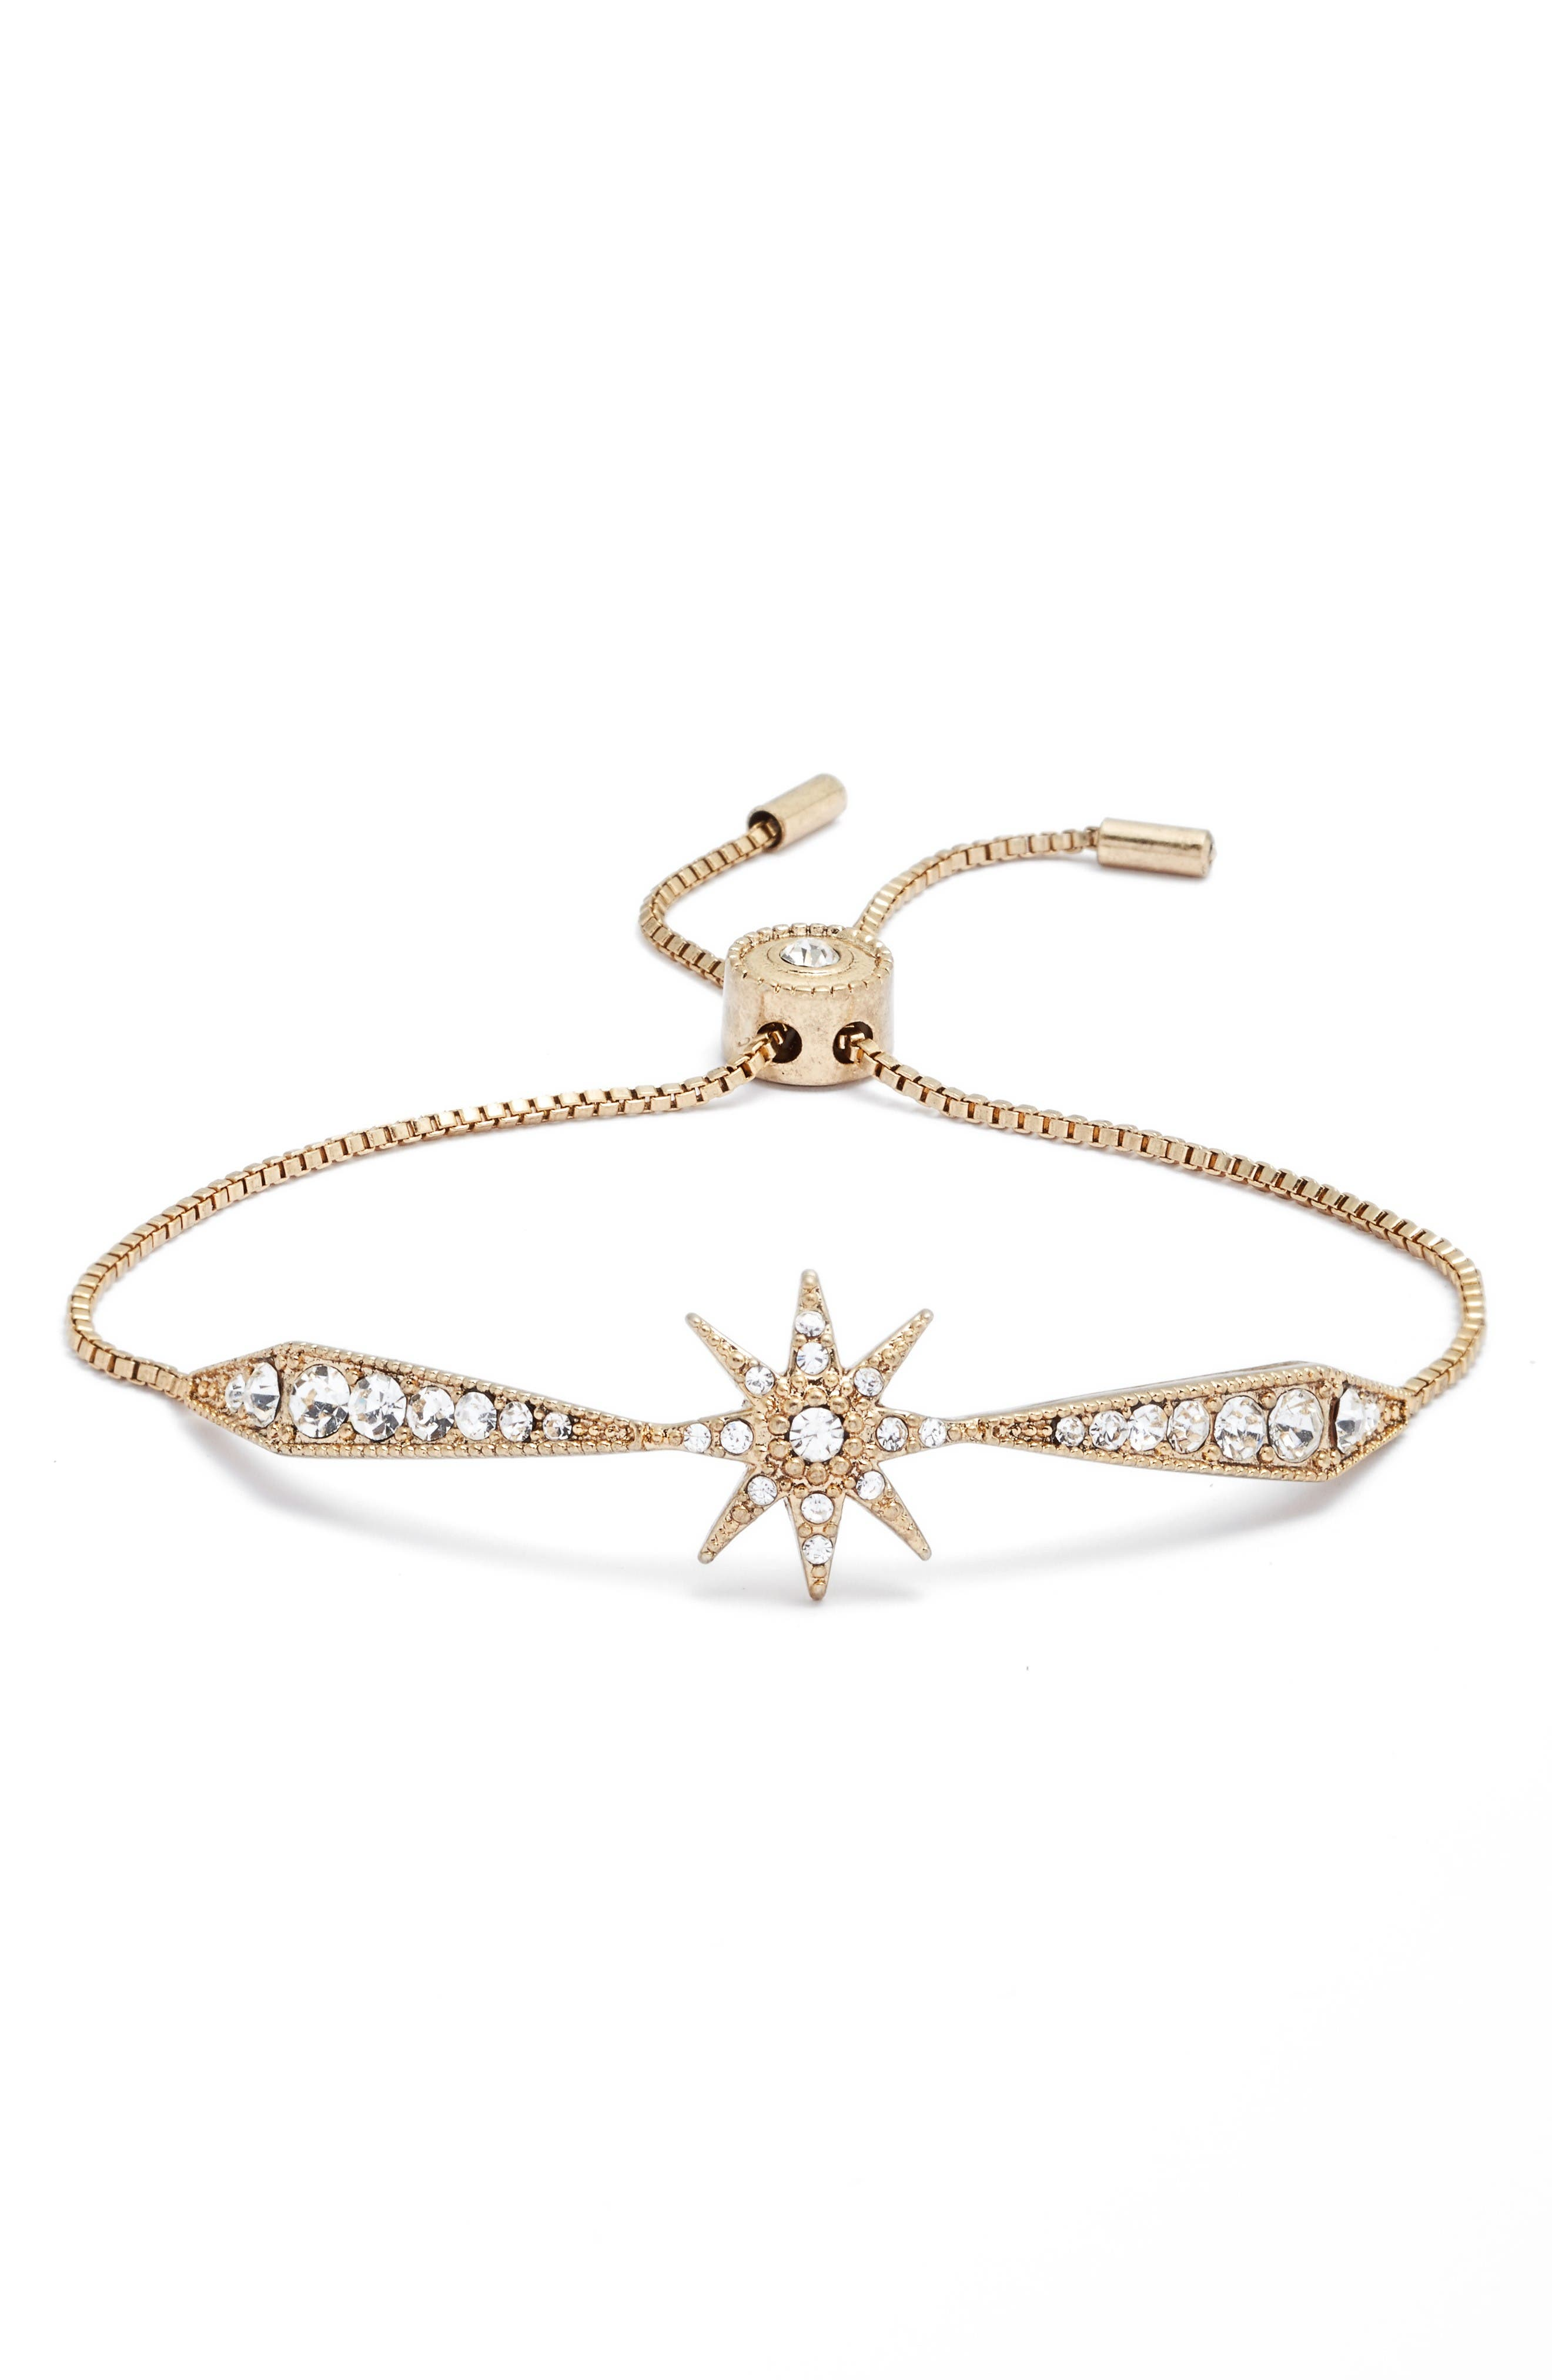 Main Image - Jenny Packham Stardust Adjustable Crystal Bracelet